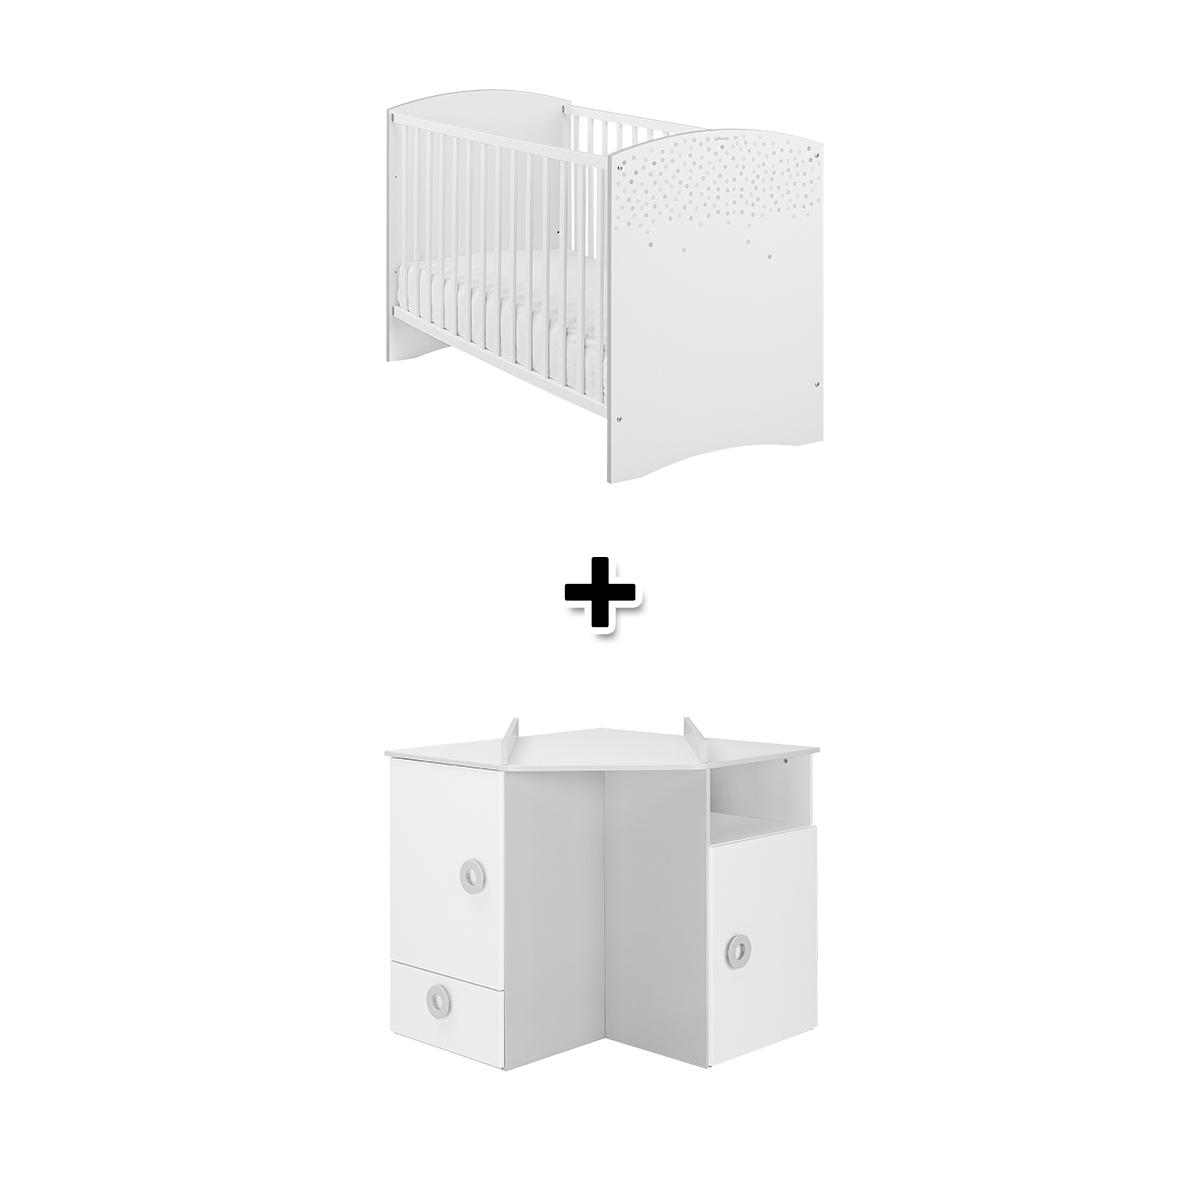 Lit 60x120 cm + commode � langer d'angle ZOE